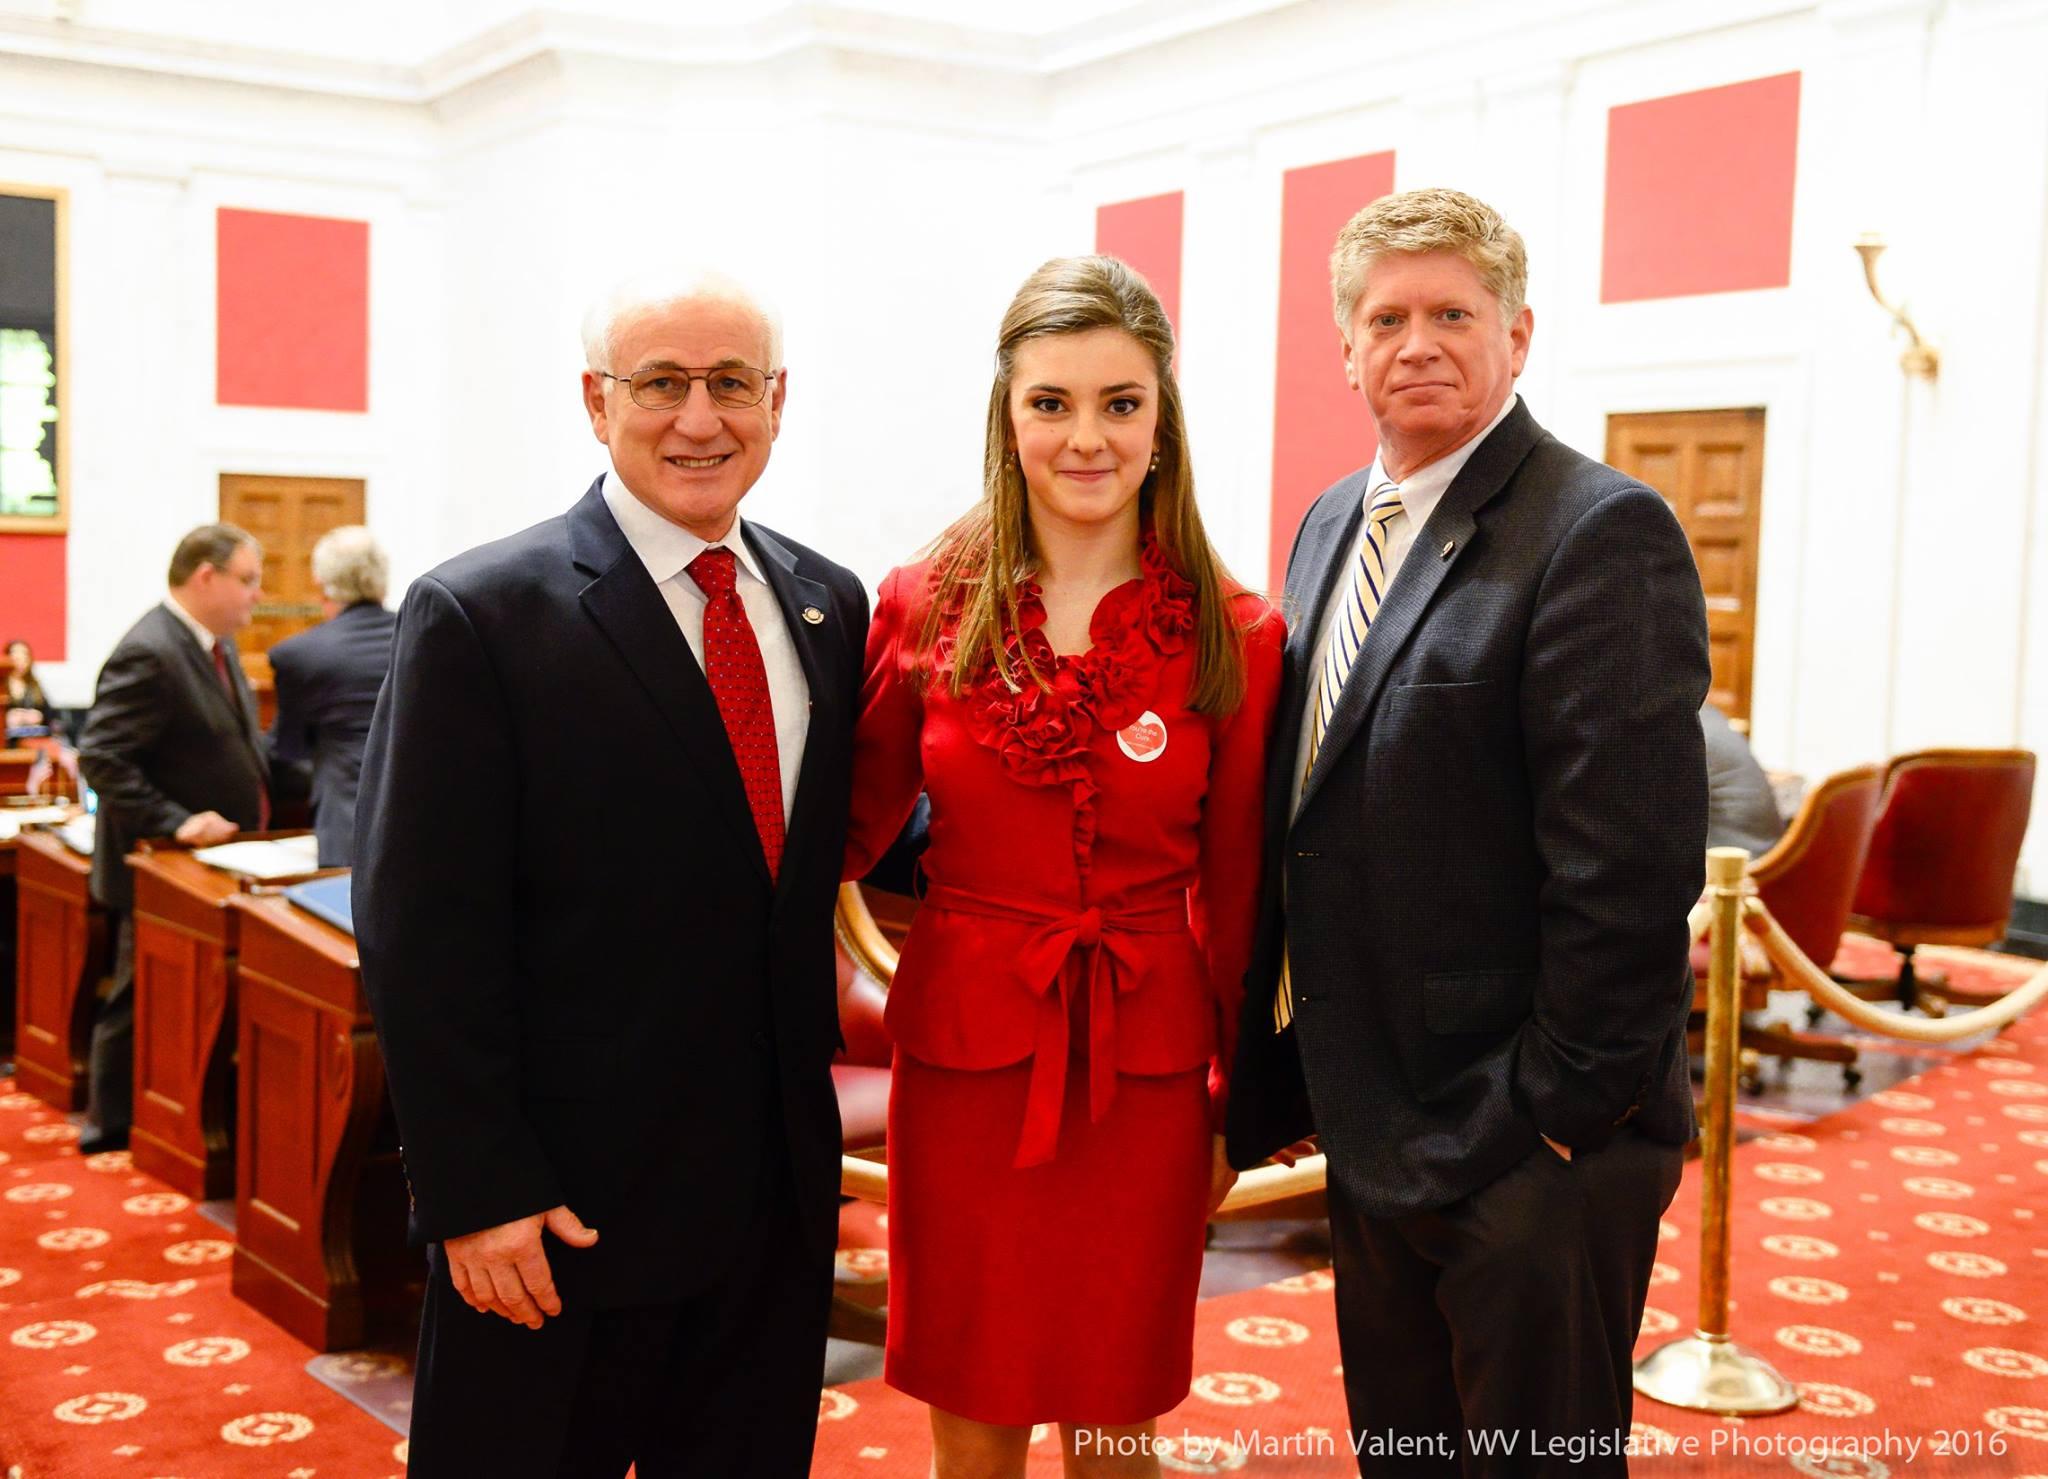 Braelynn Neely on Senate Floor